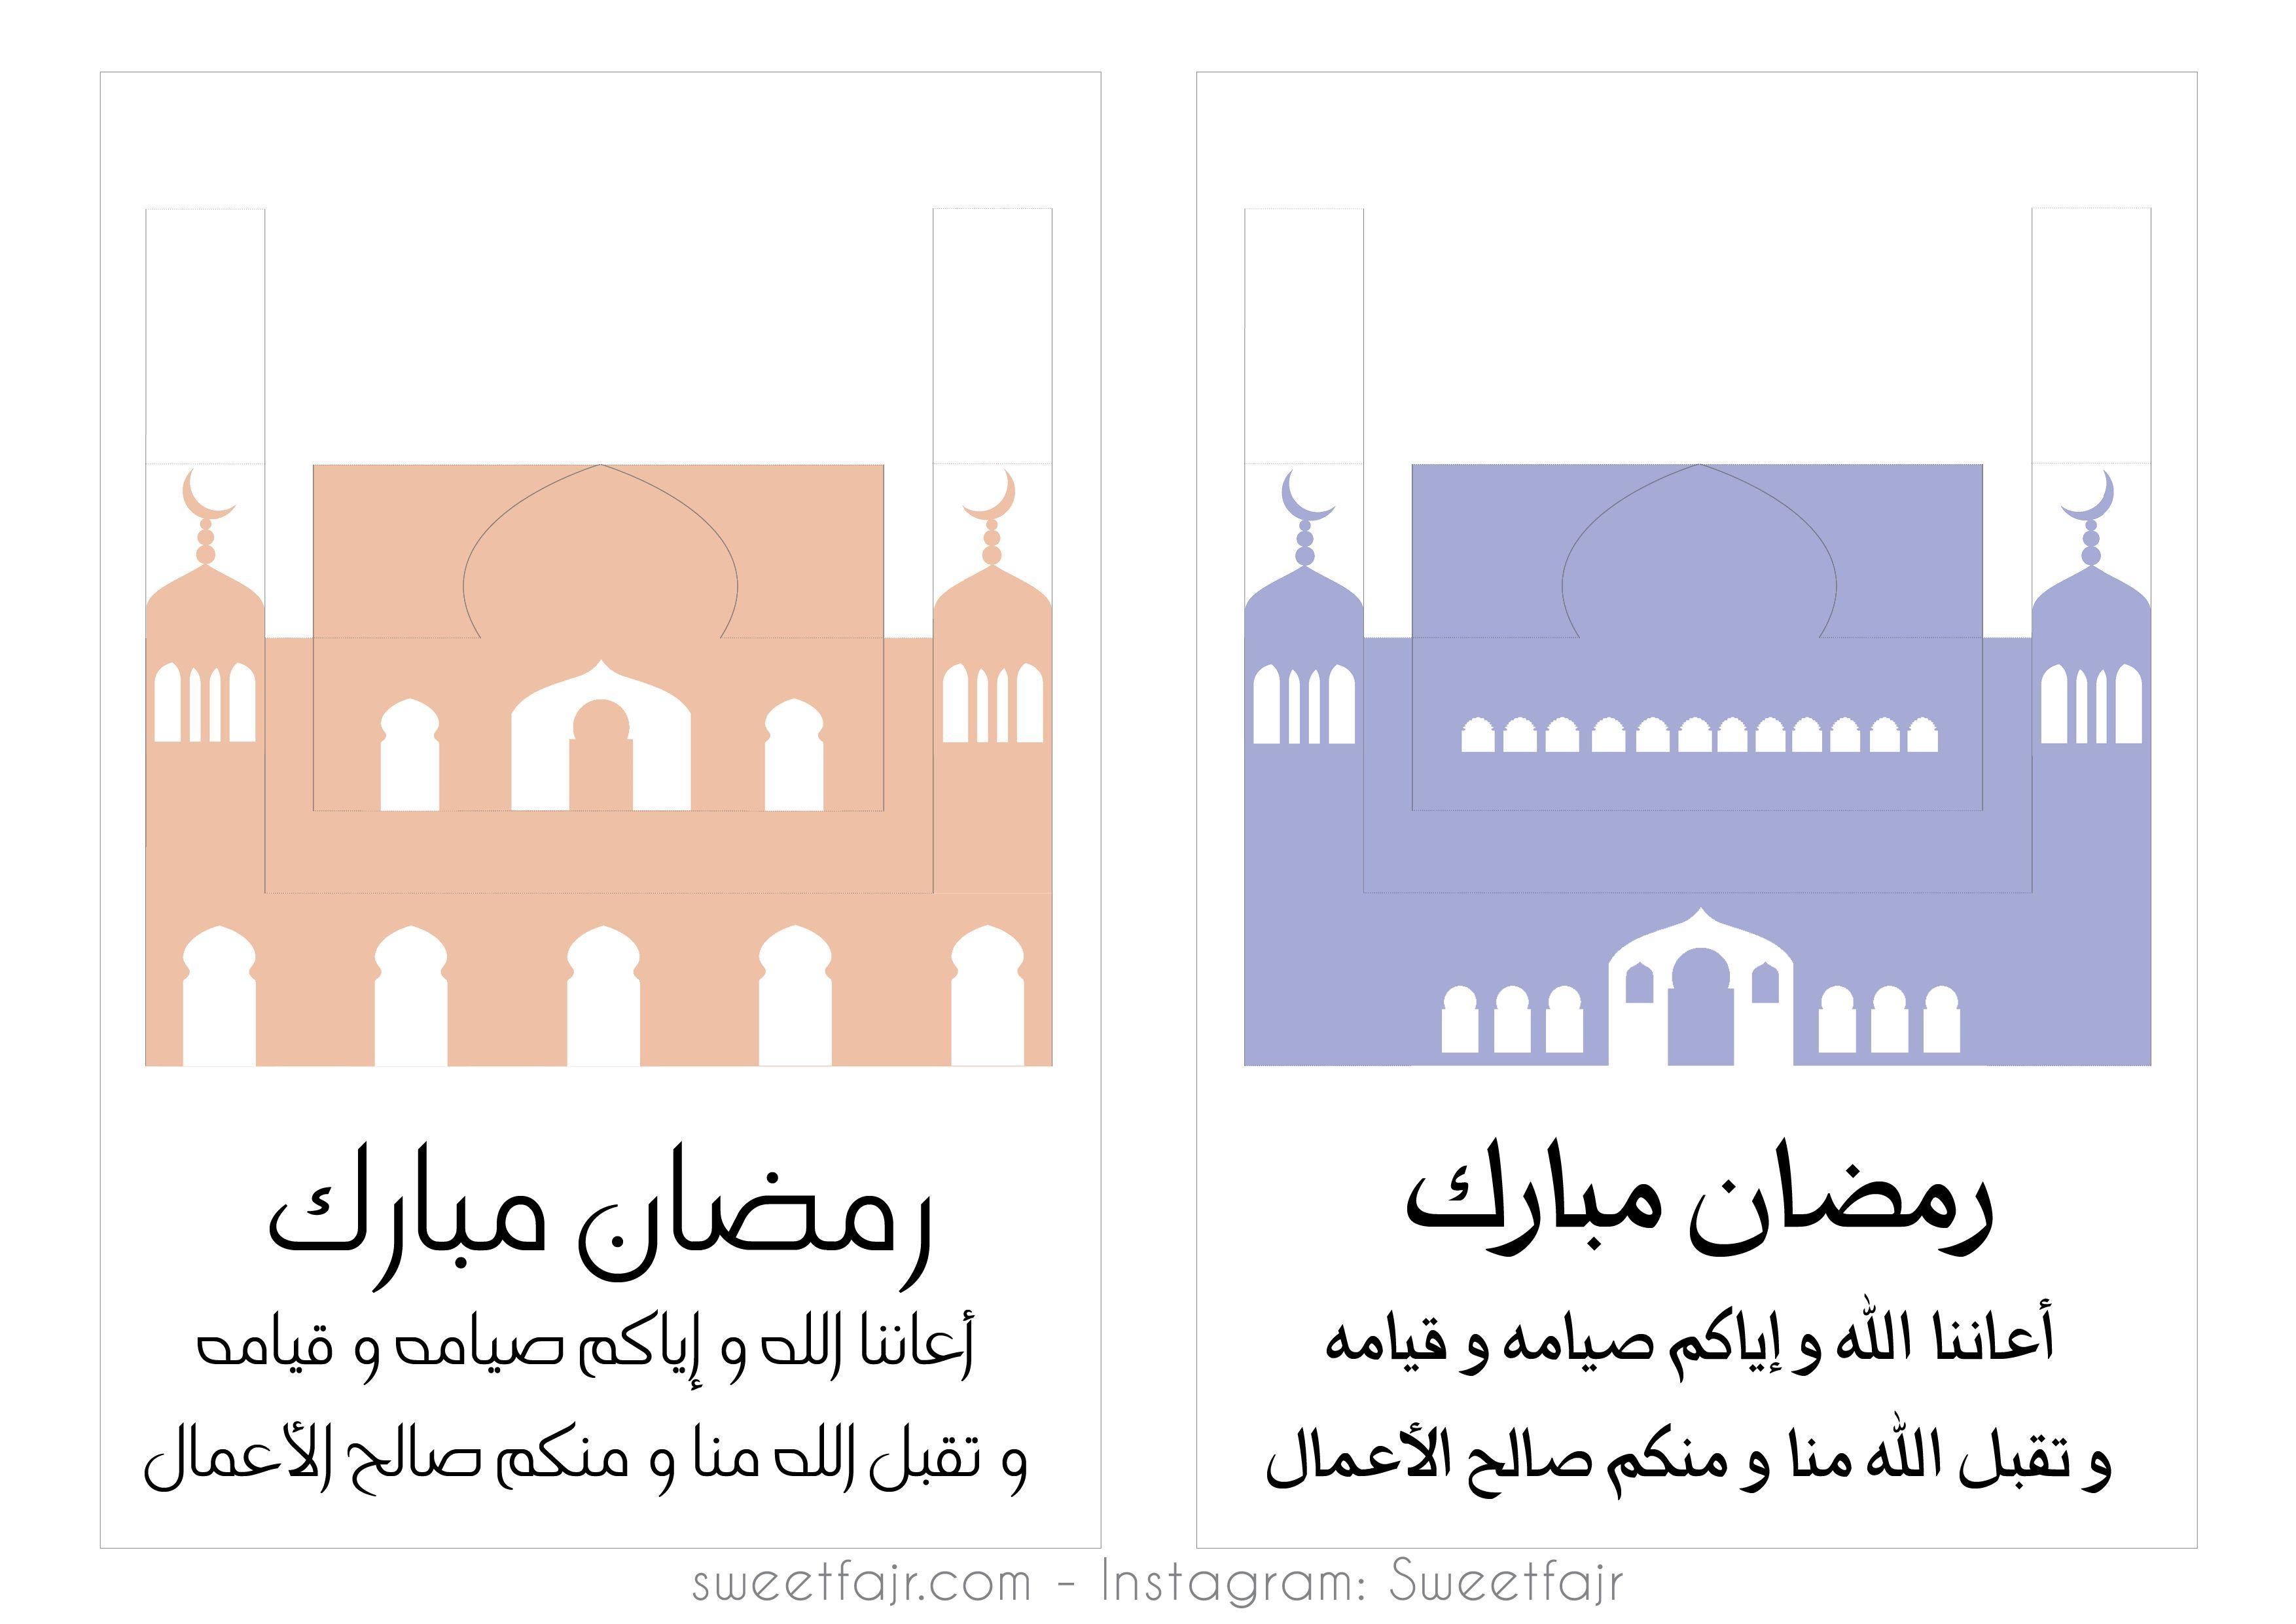 Pop Up Card Templates For Ramadan | Free Printable Pop-Up Mosque - Free Printable Pop Up Card Templates